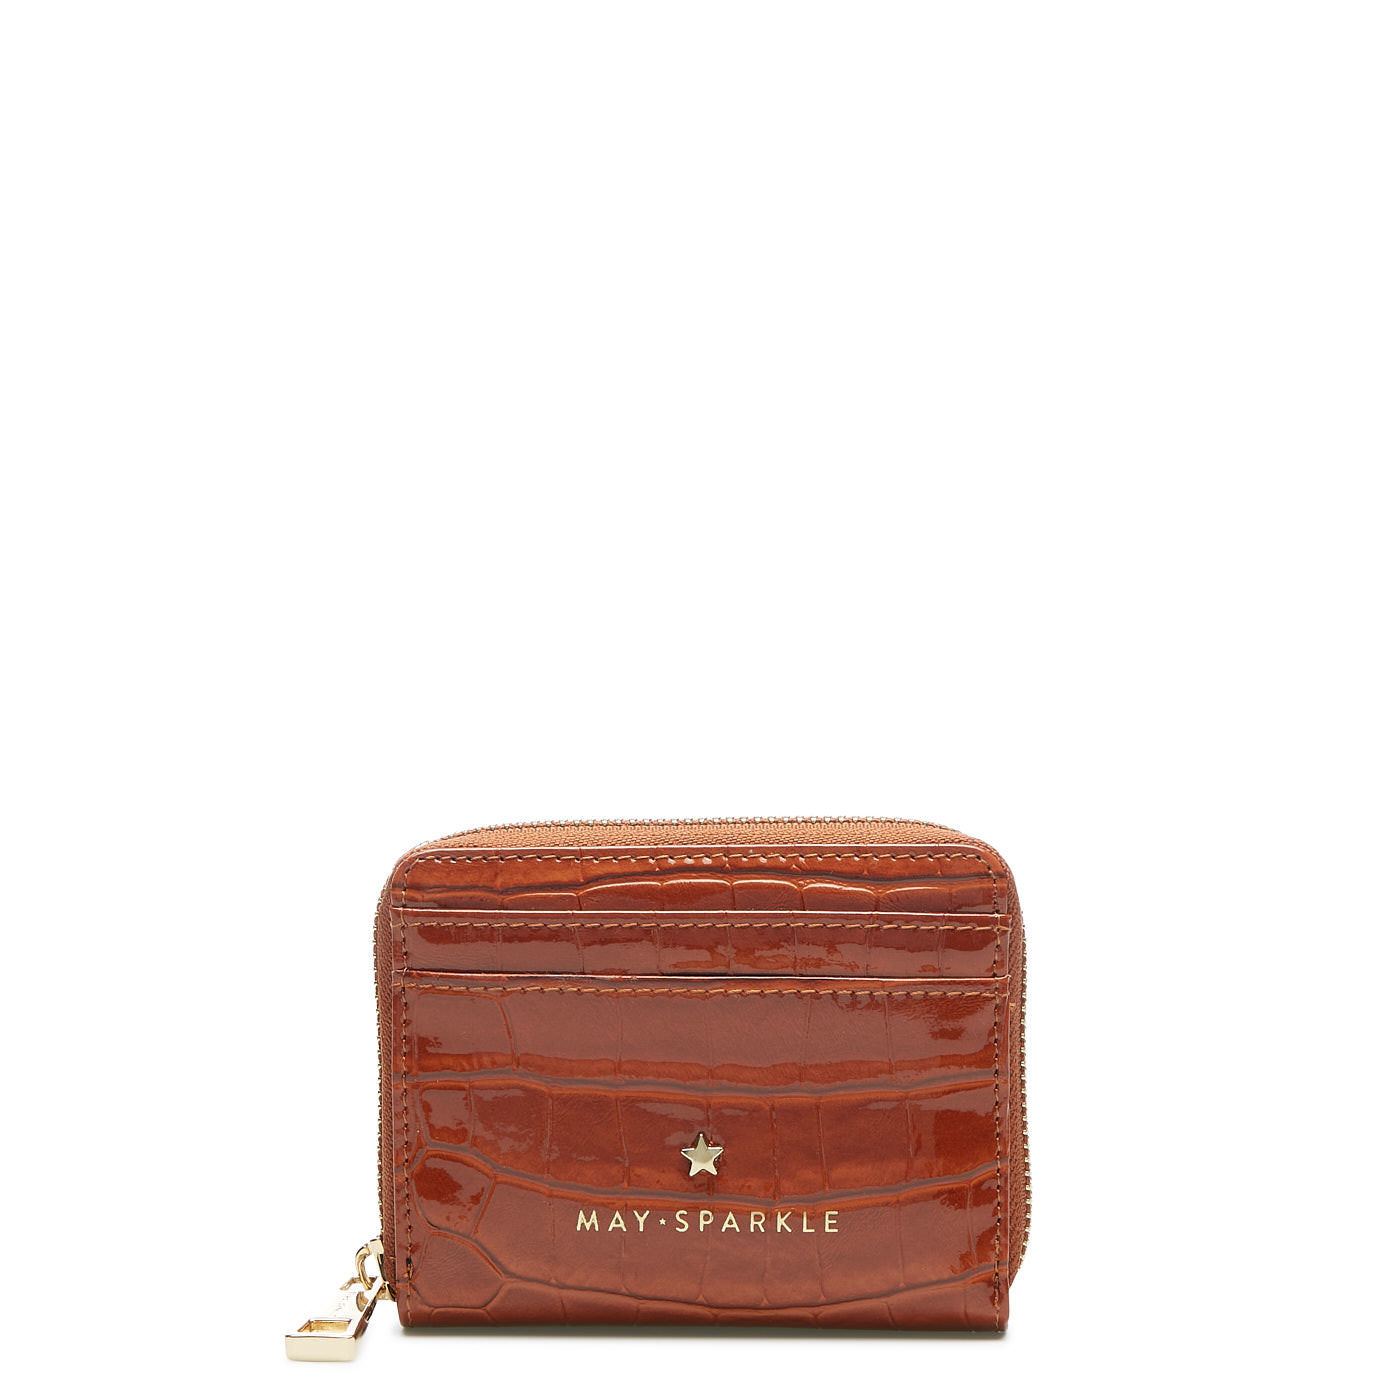 May Sparkle Festive cognac croco Zipper wallet